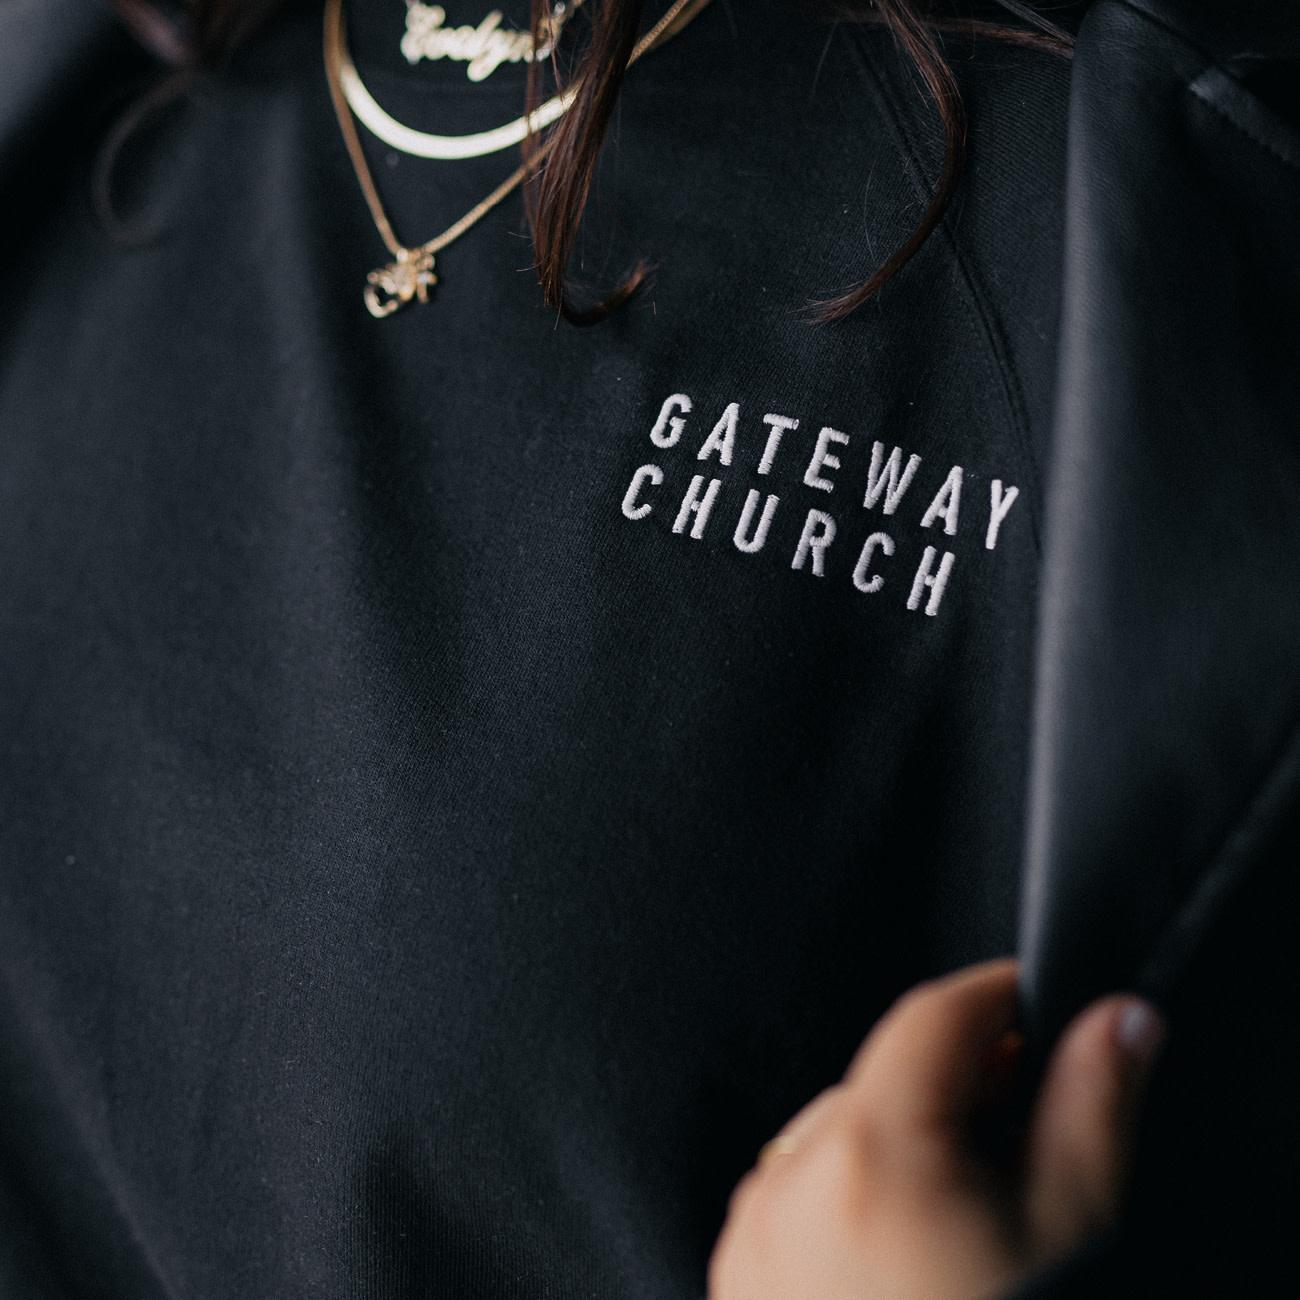 Gateway Church Pullover